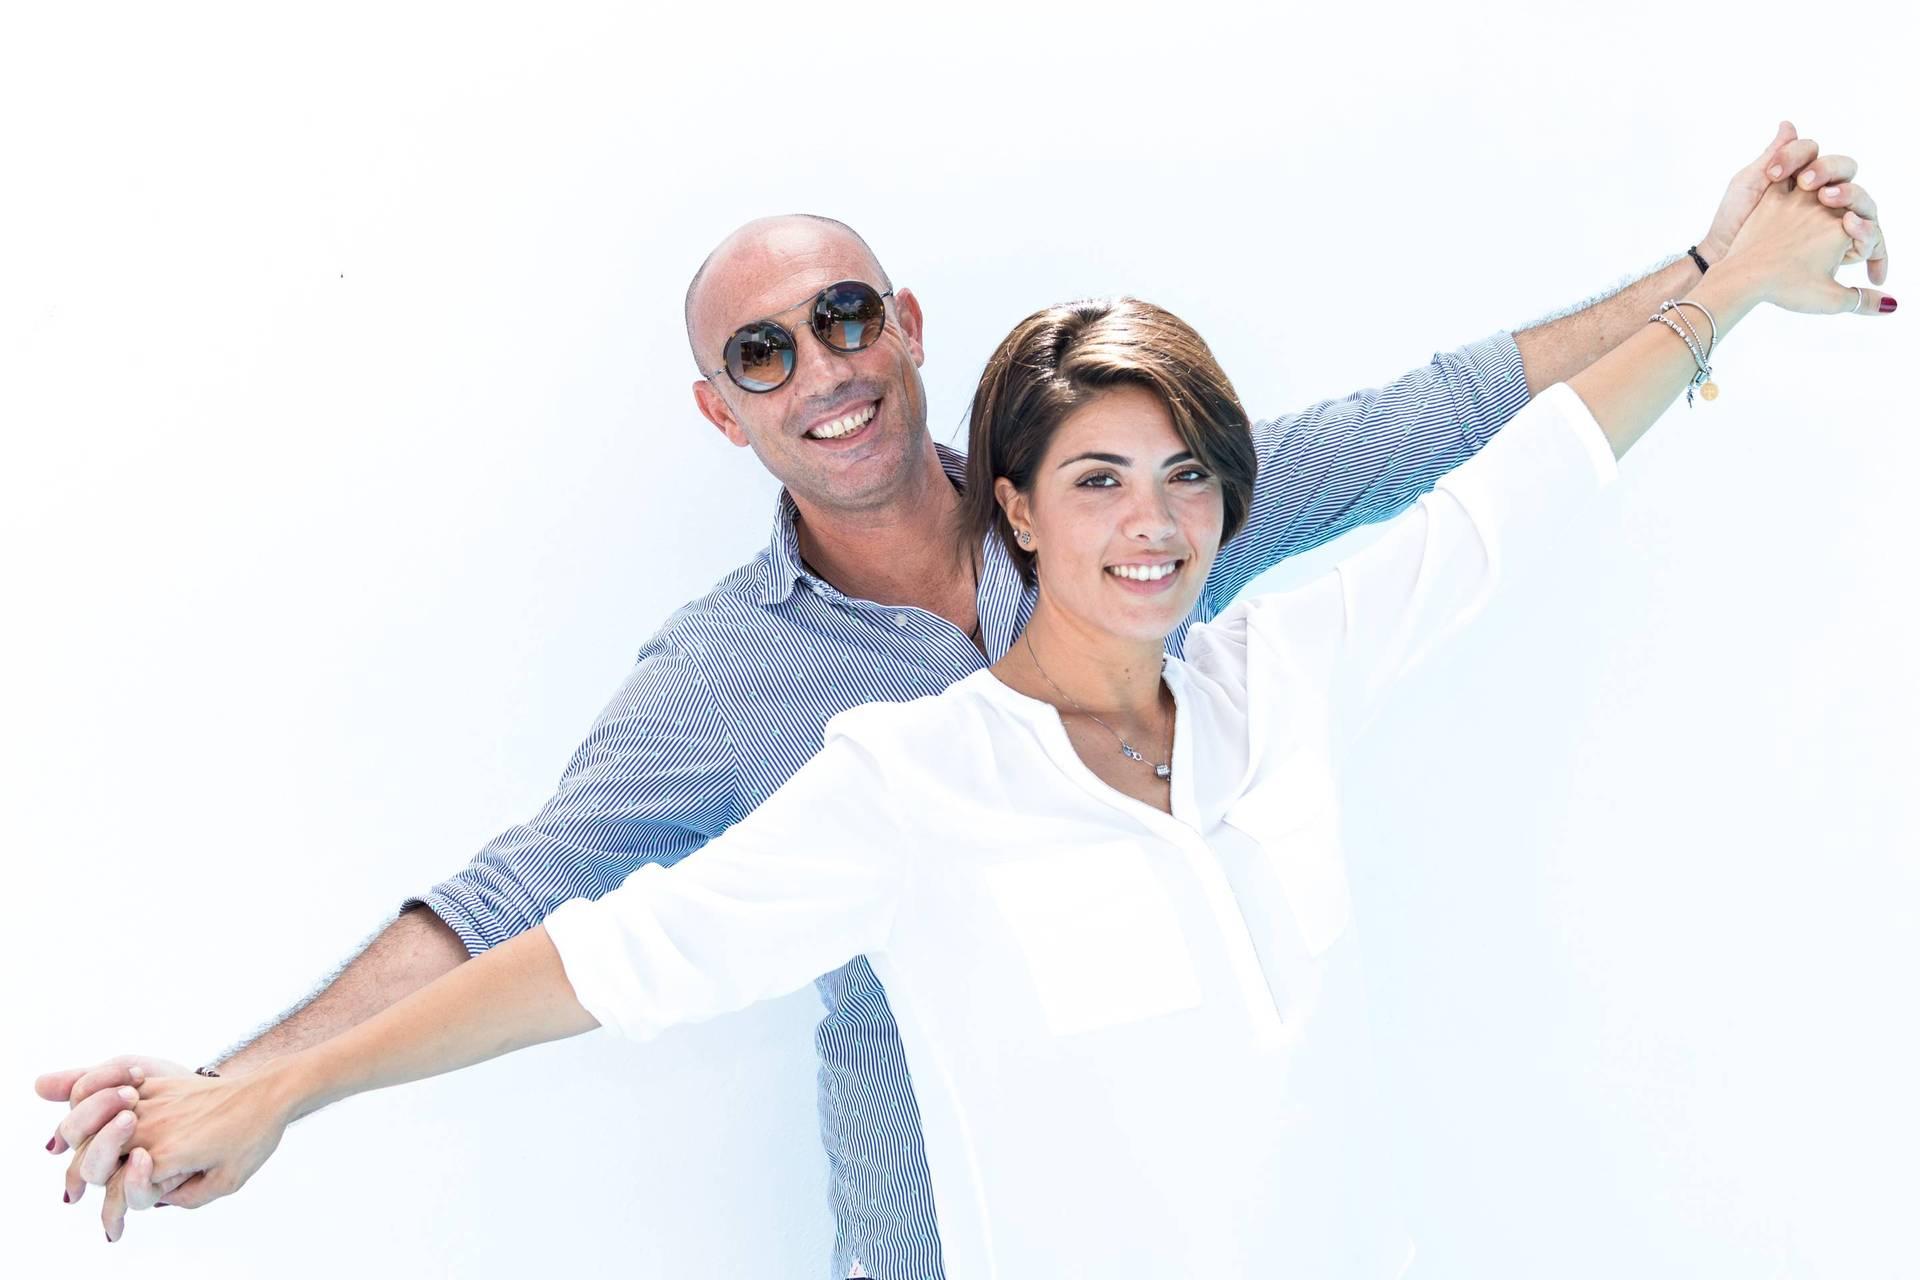 Giuseppe and Lia